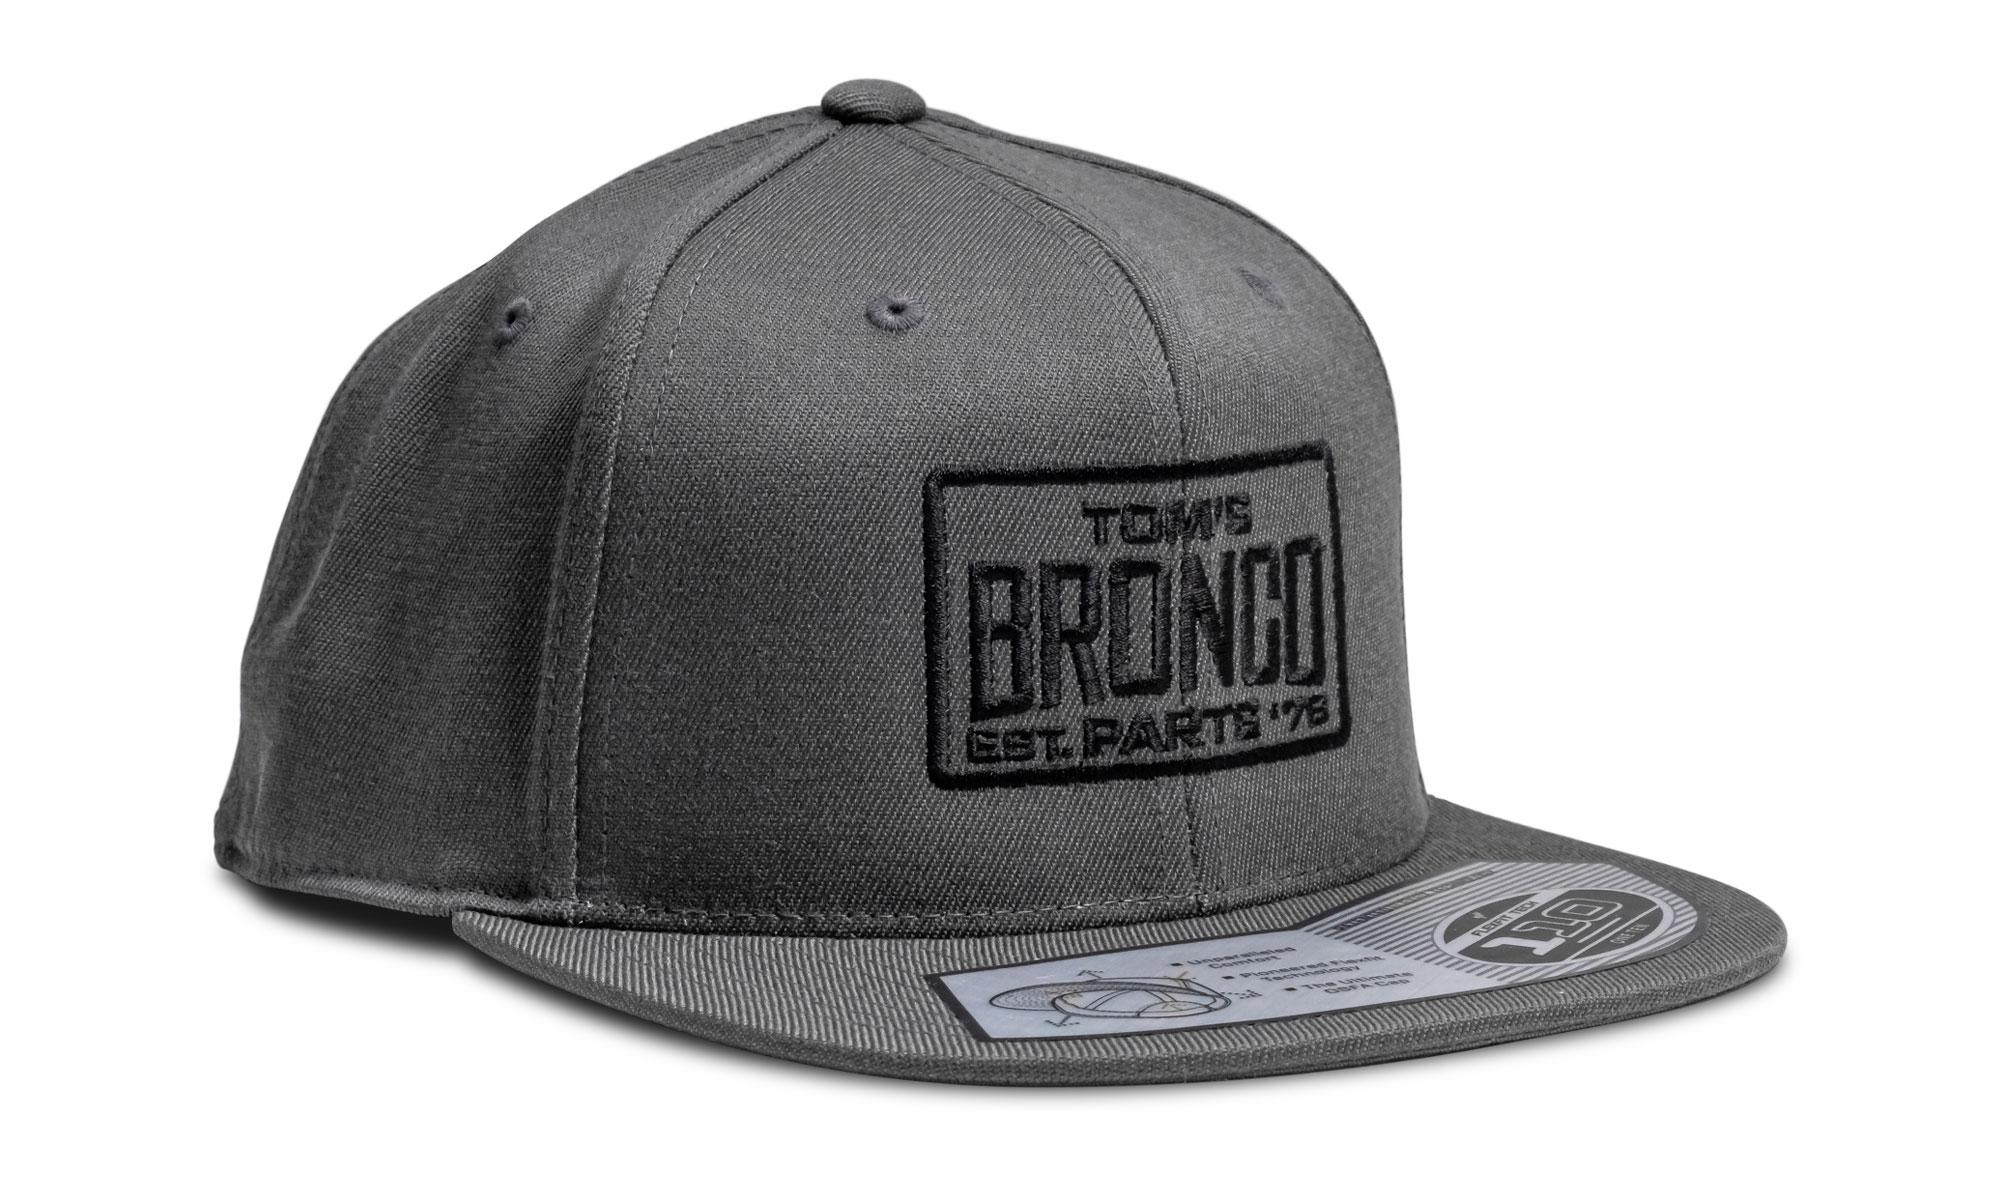 TBP 110 Box Logo Hat - Gray w/Black Thread